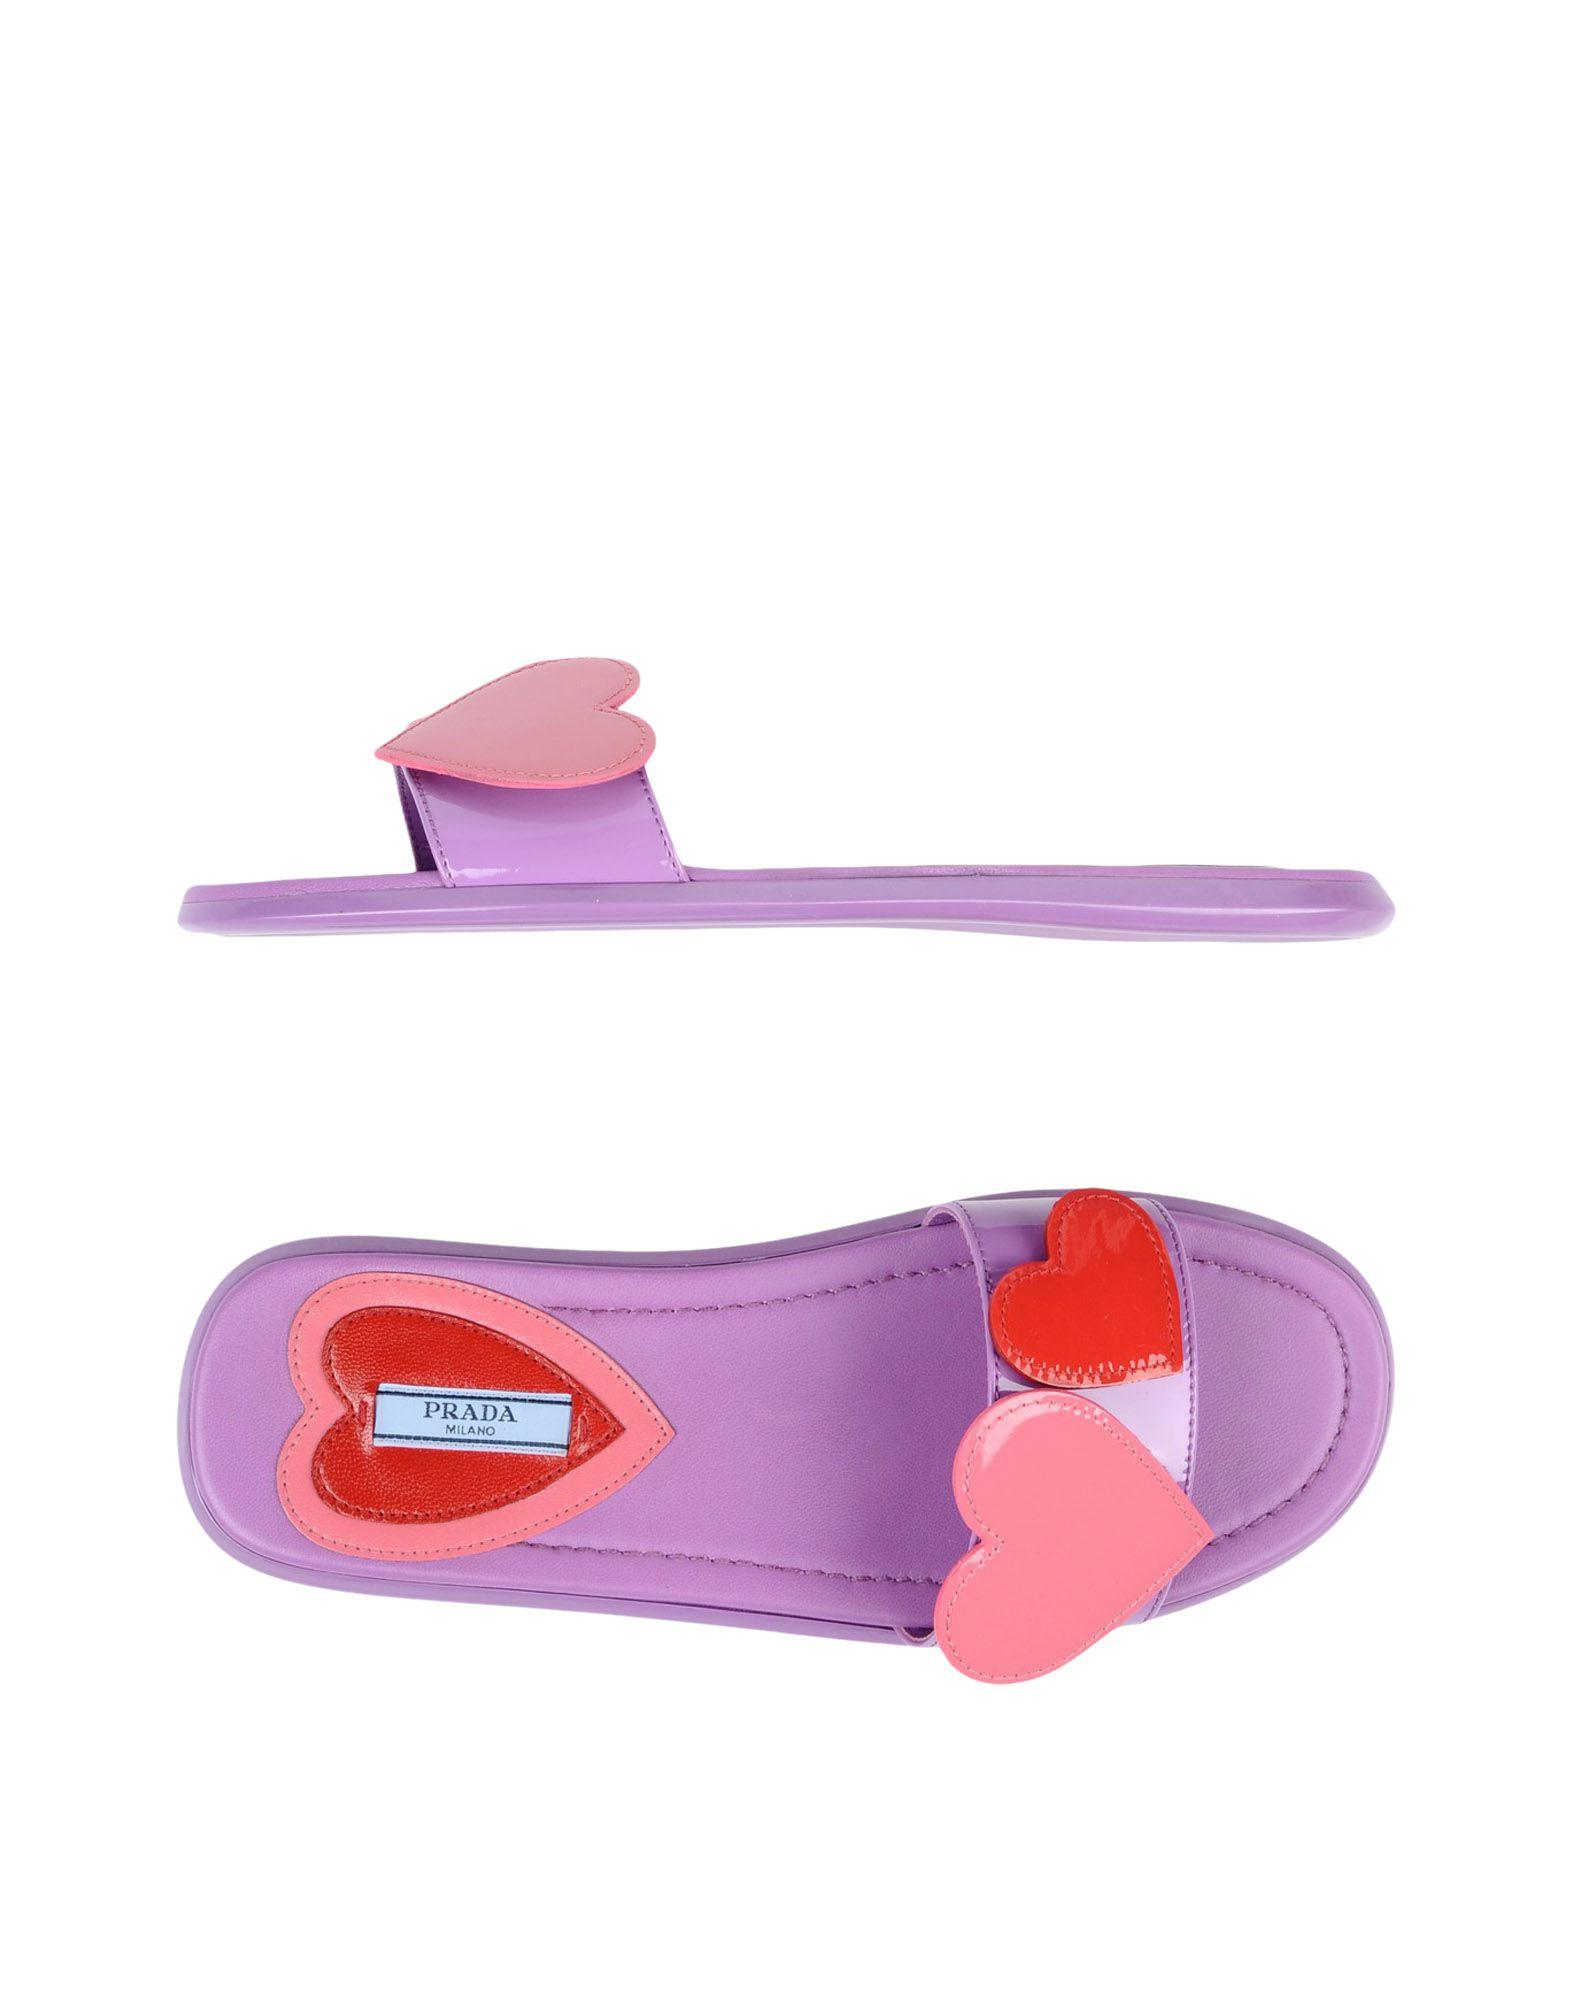 Haltbare Mode billige Schuhe Prada Sandalen Damen  11399991UO Heiße Schuhe